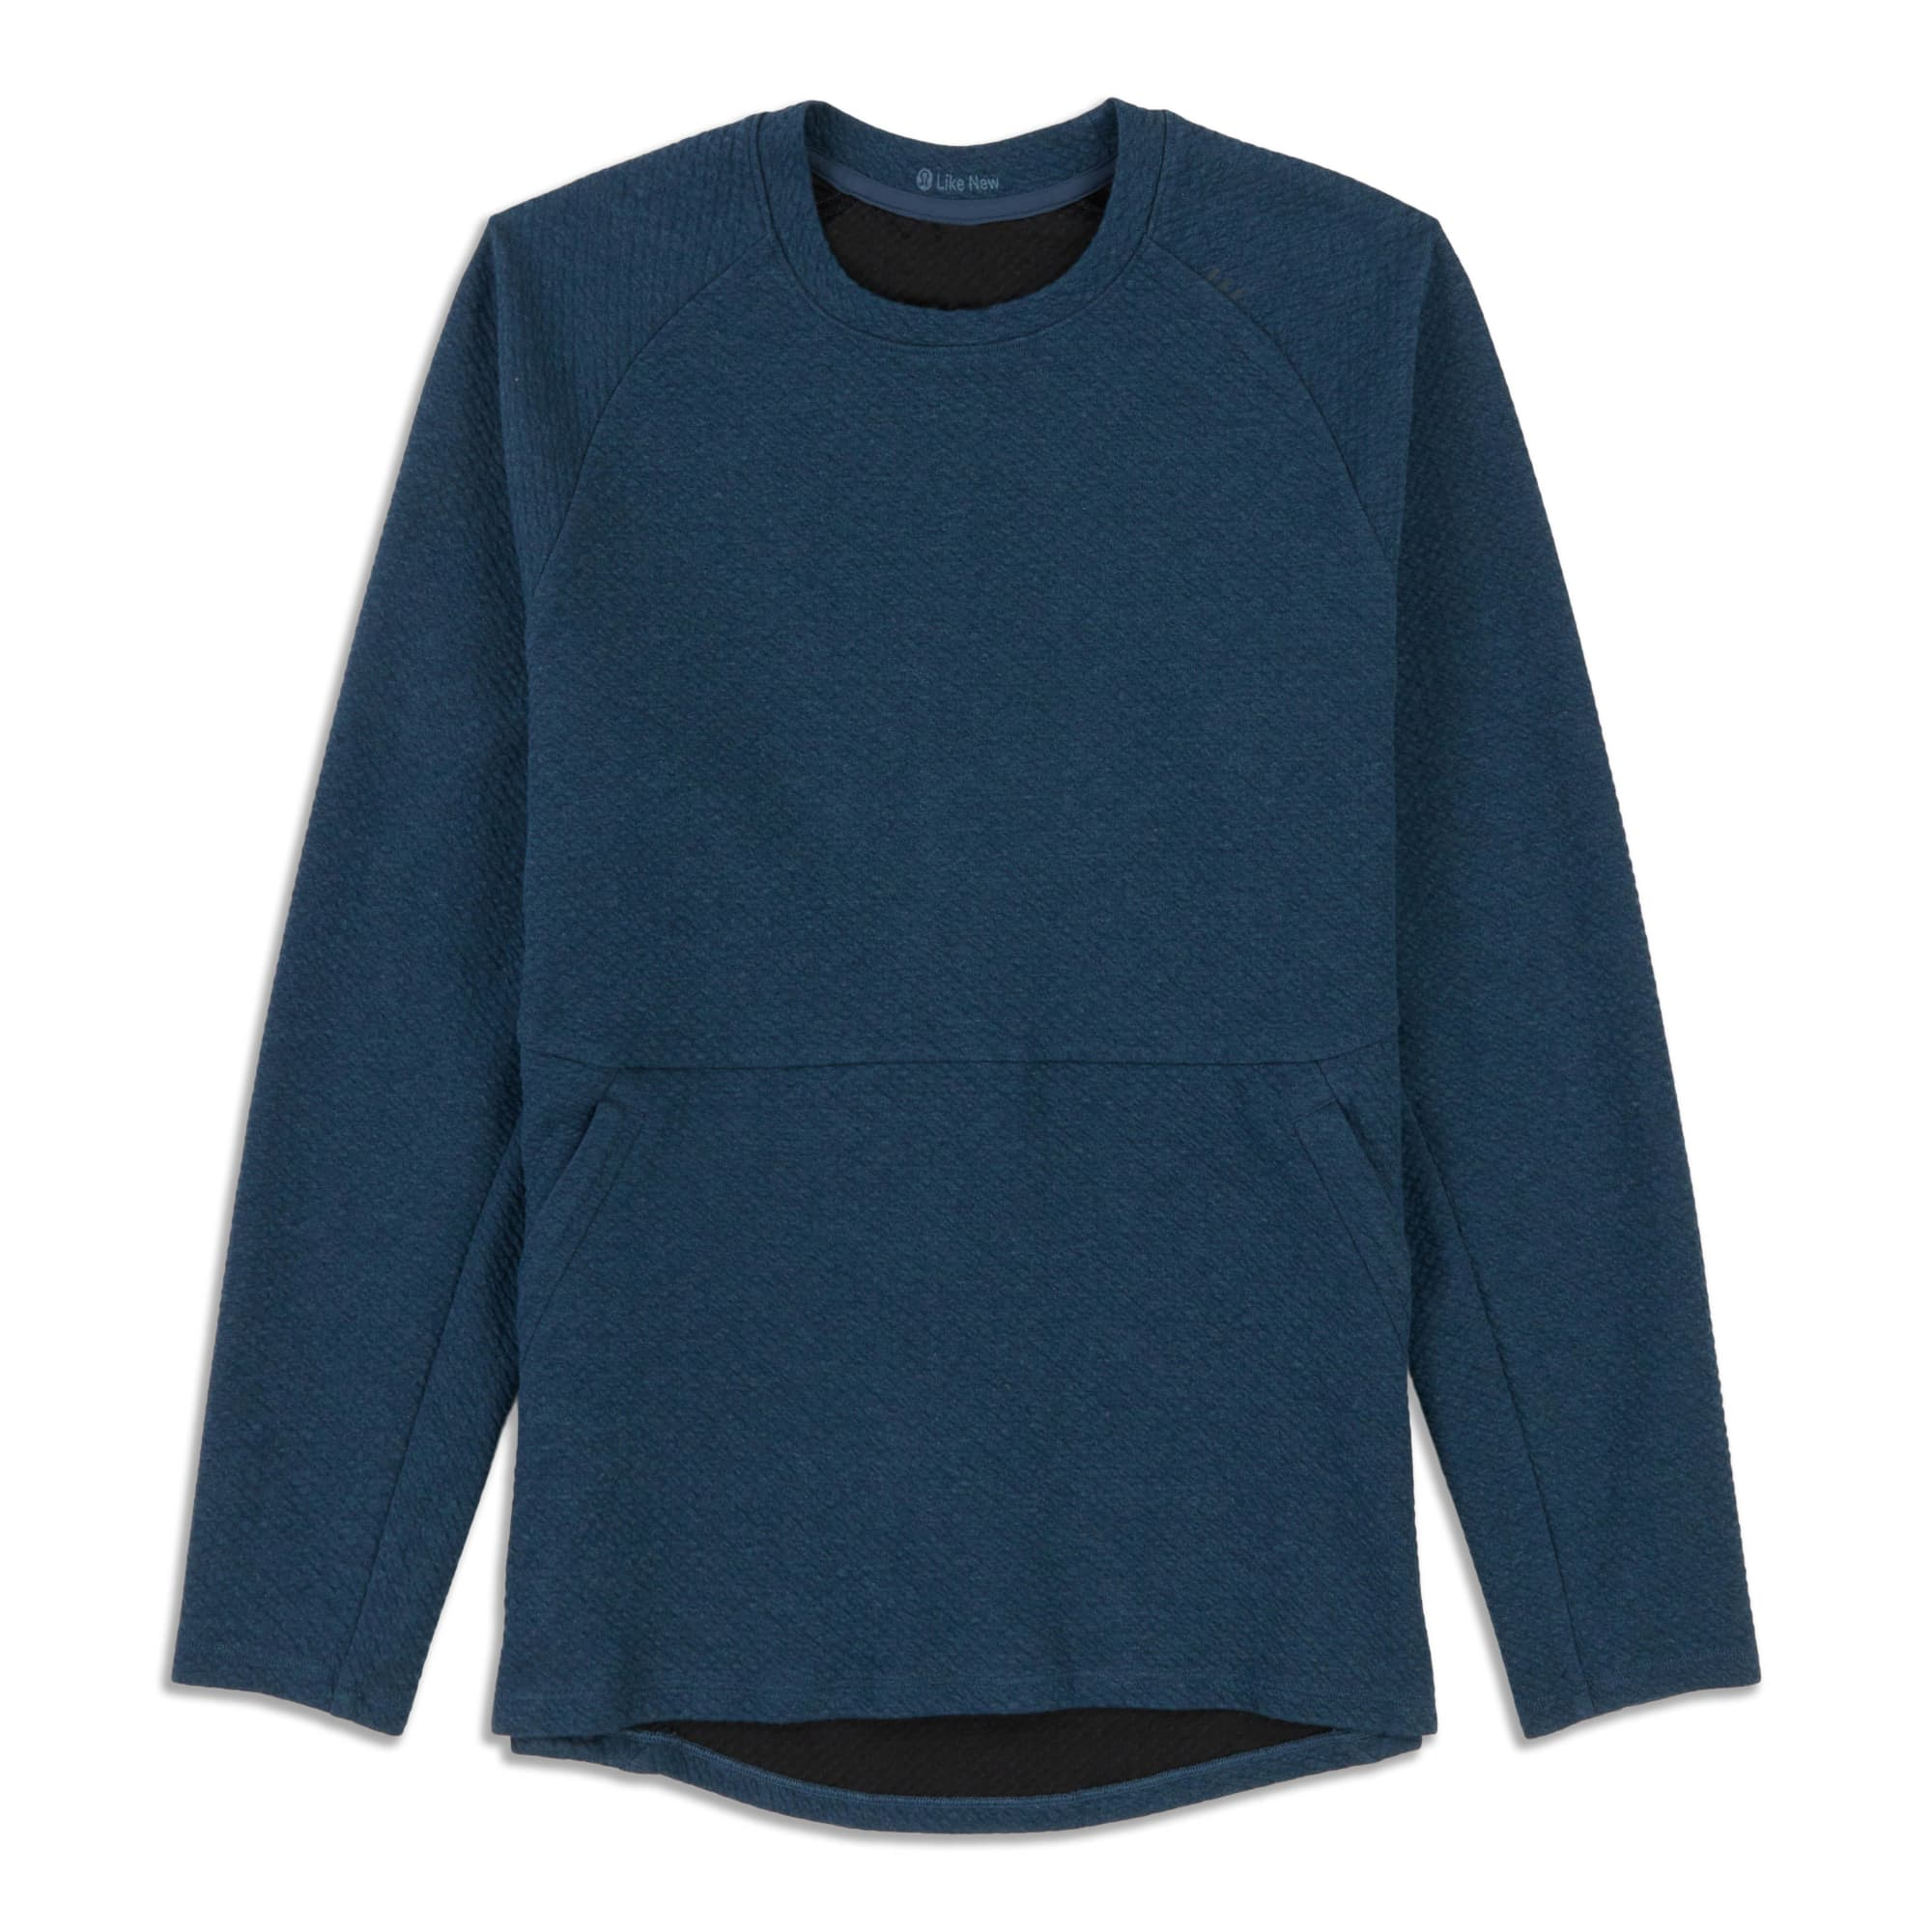 Main product image: Men's Sweatshirt - Resale